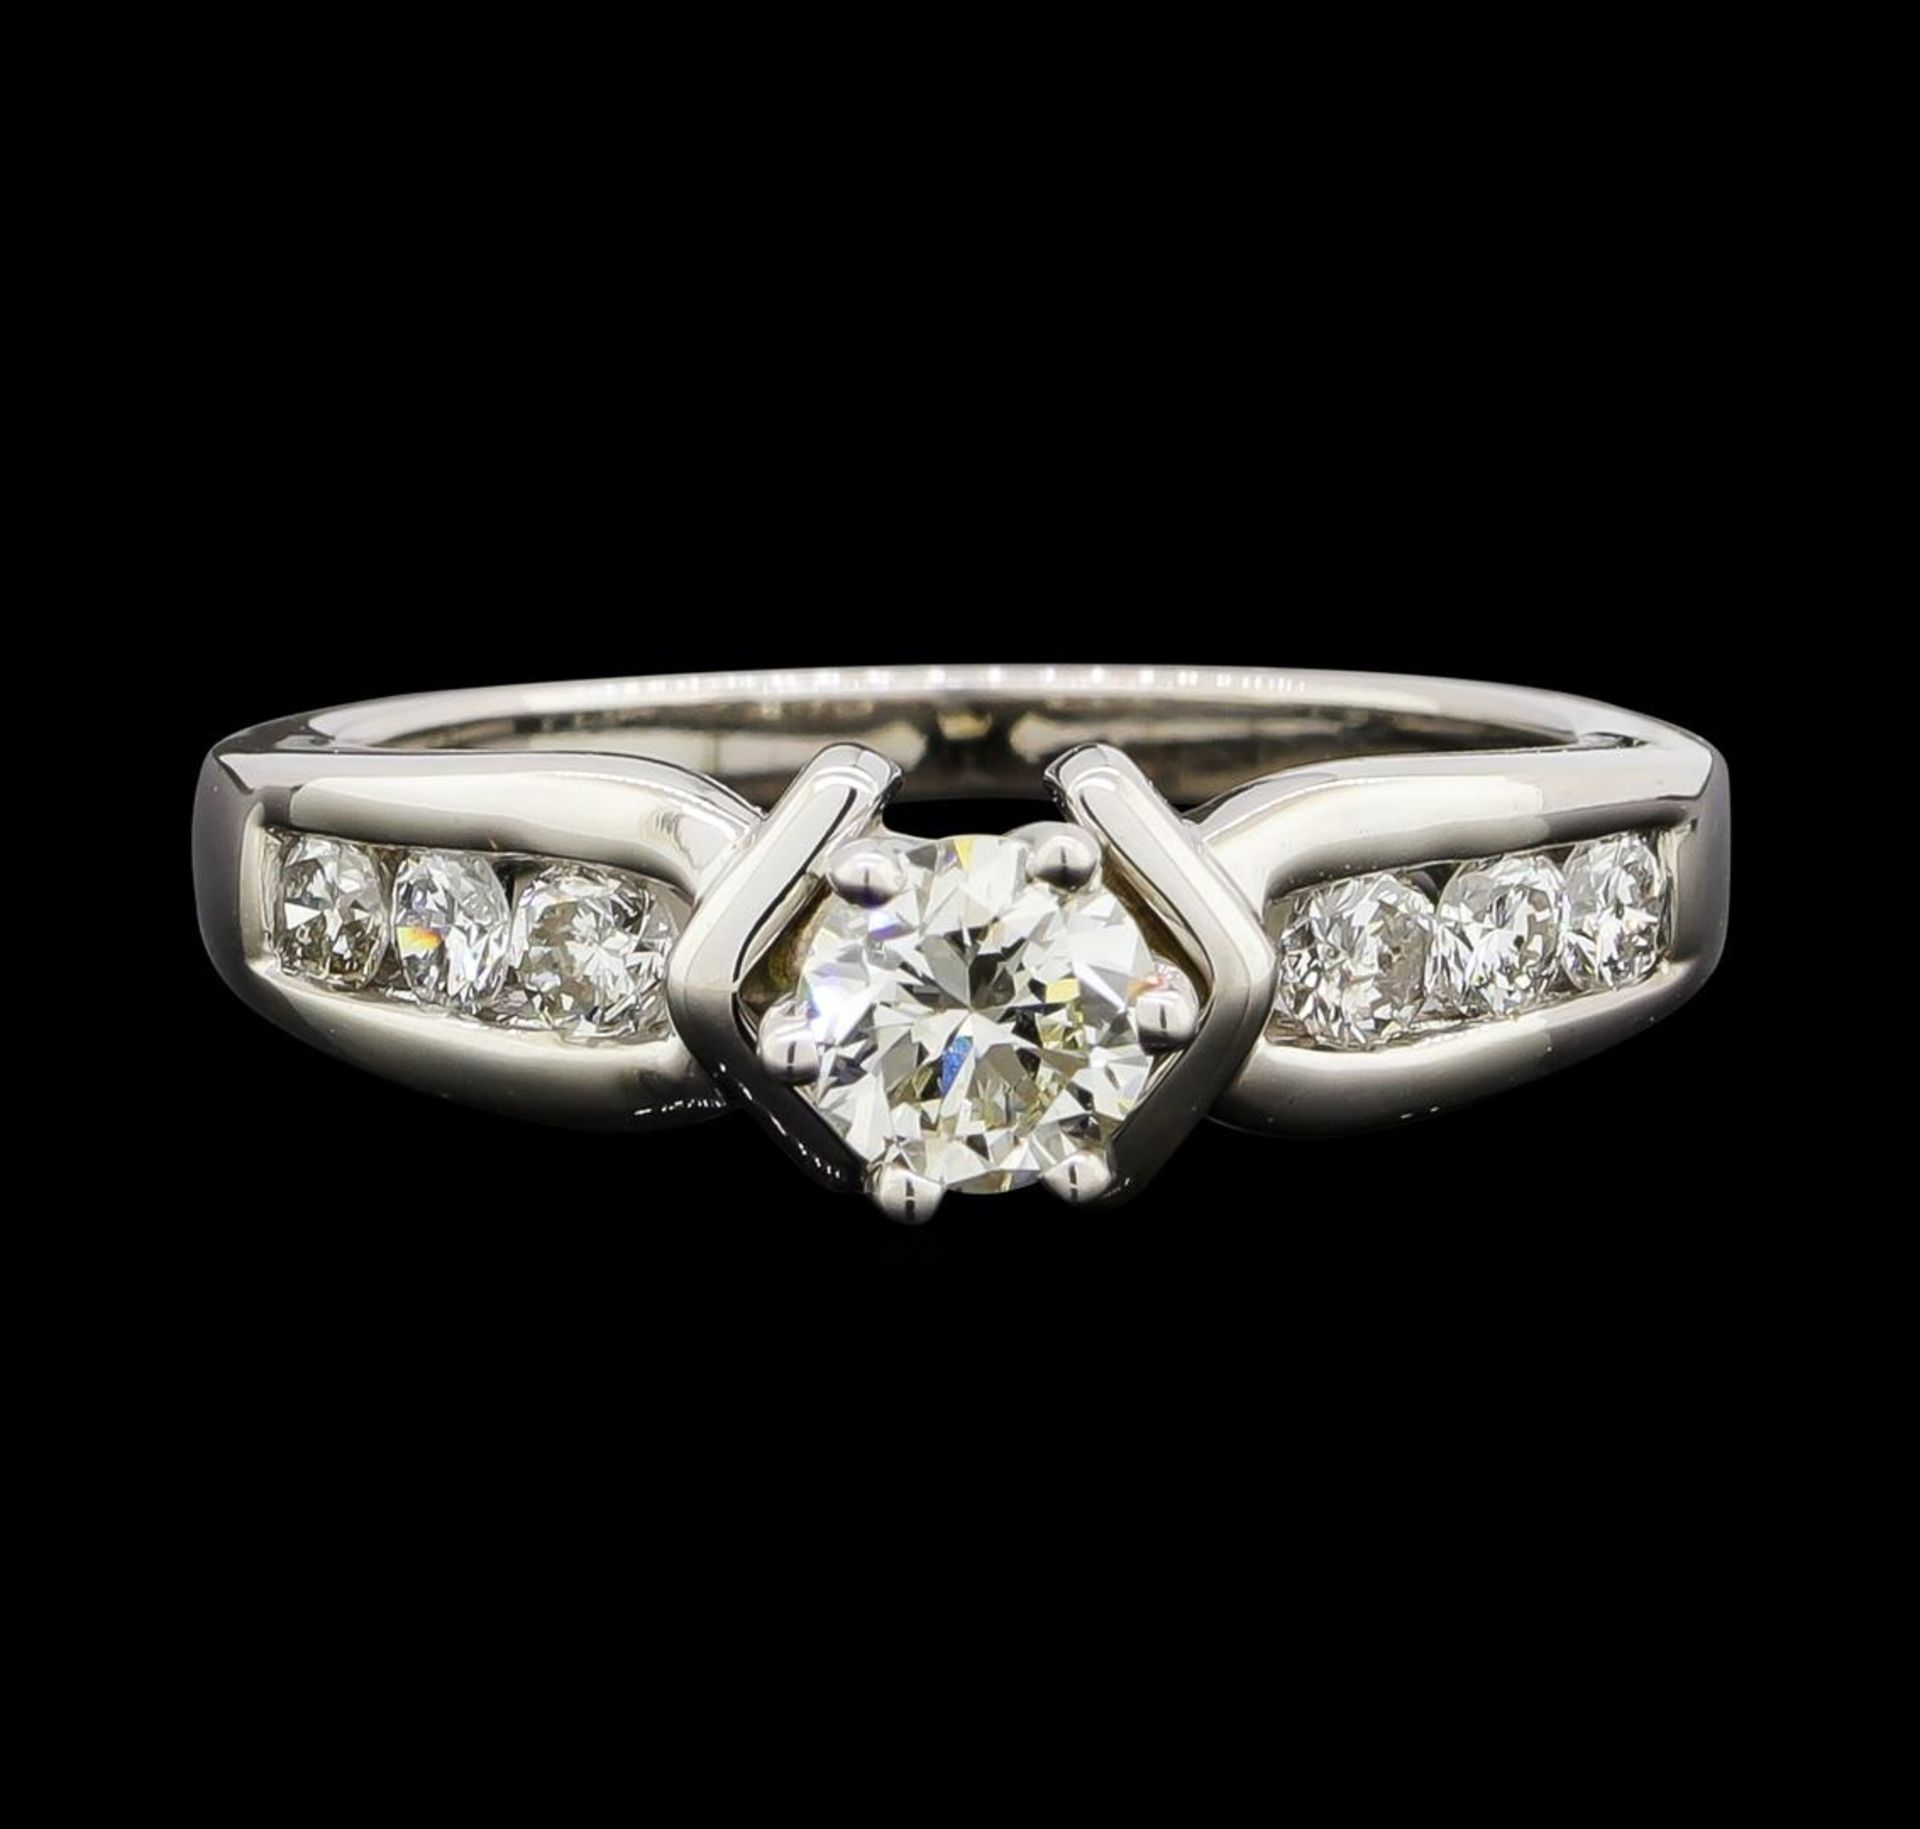 0.80 ctw Diamond Ring - 14KT White Gold - Image 2 of 4